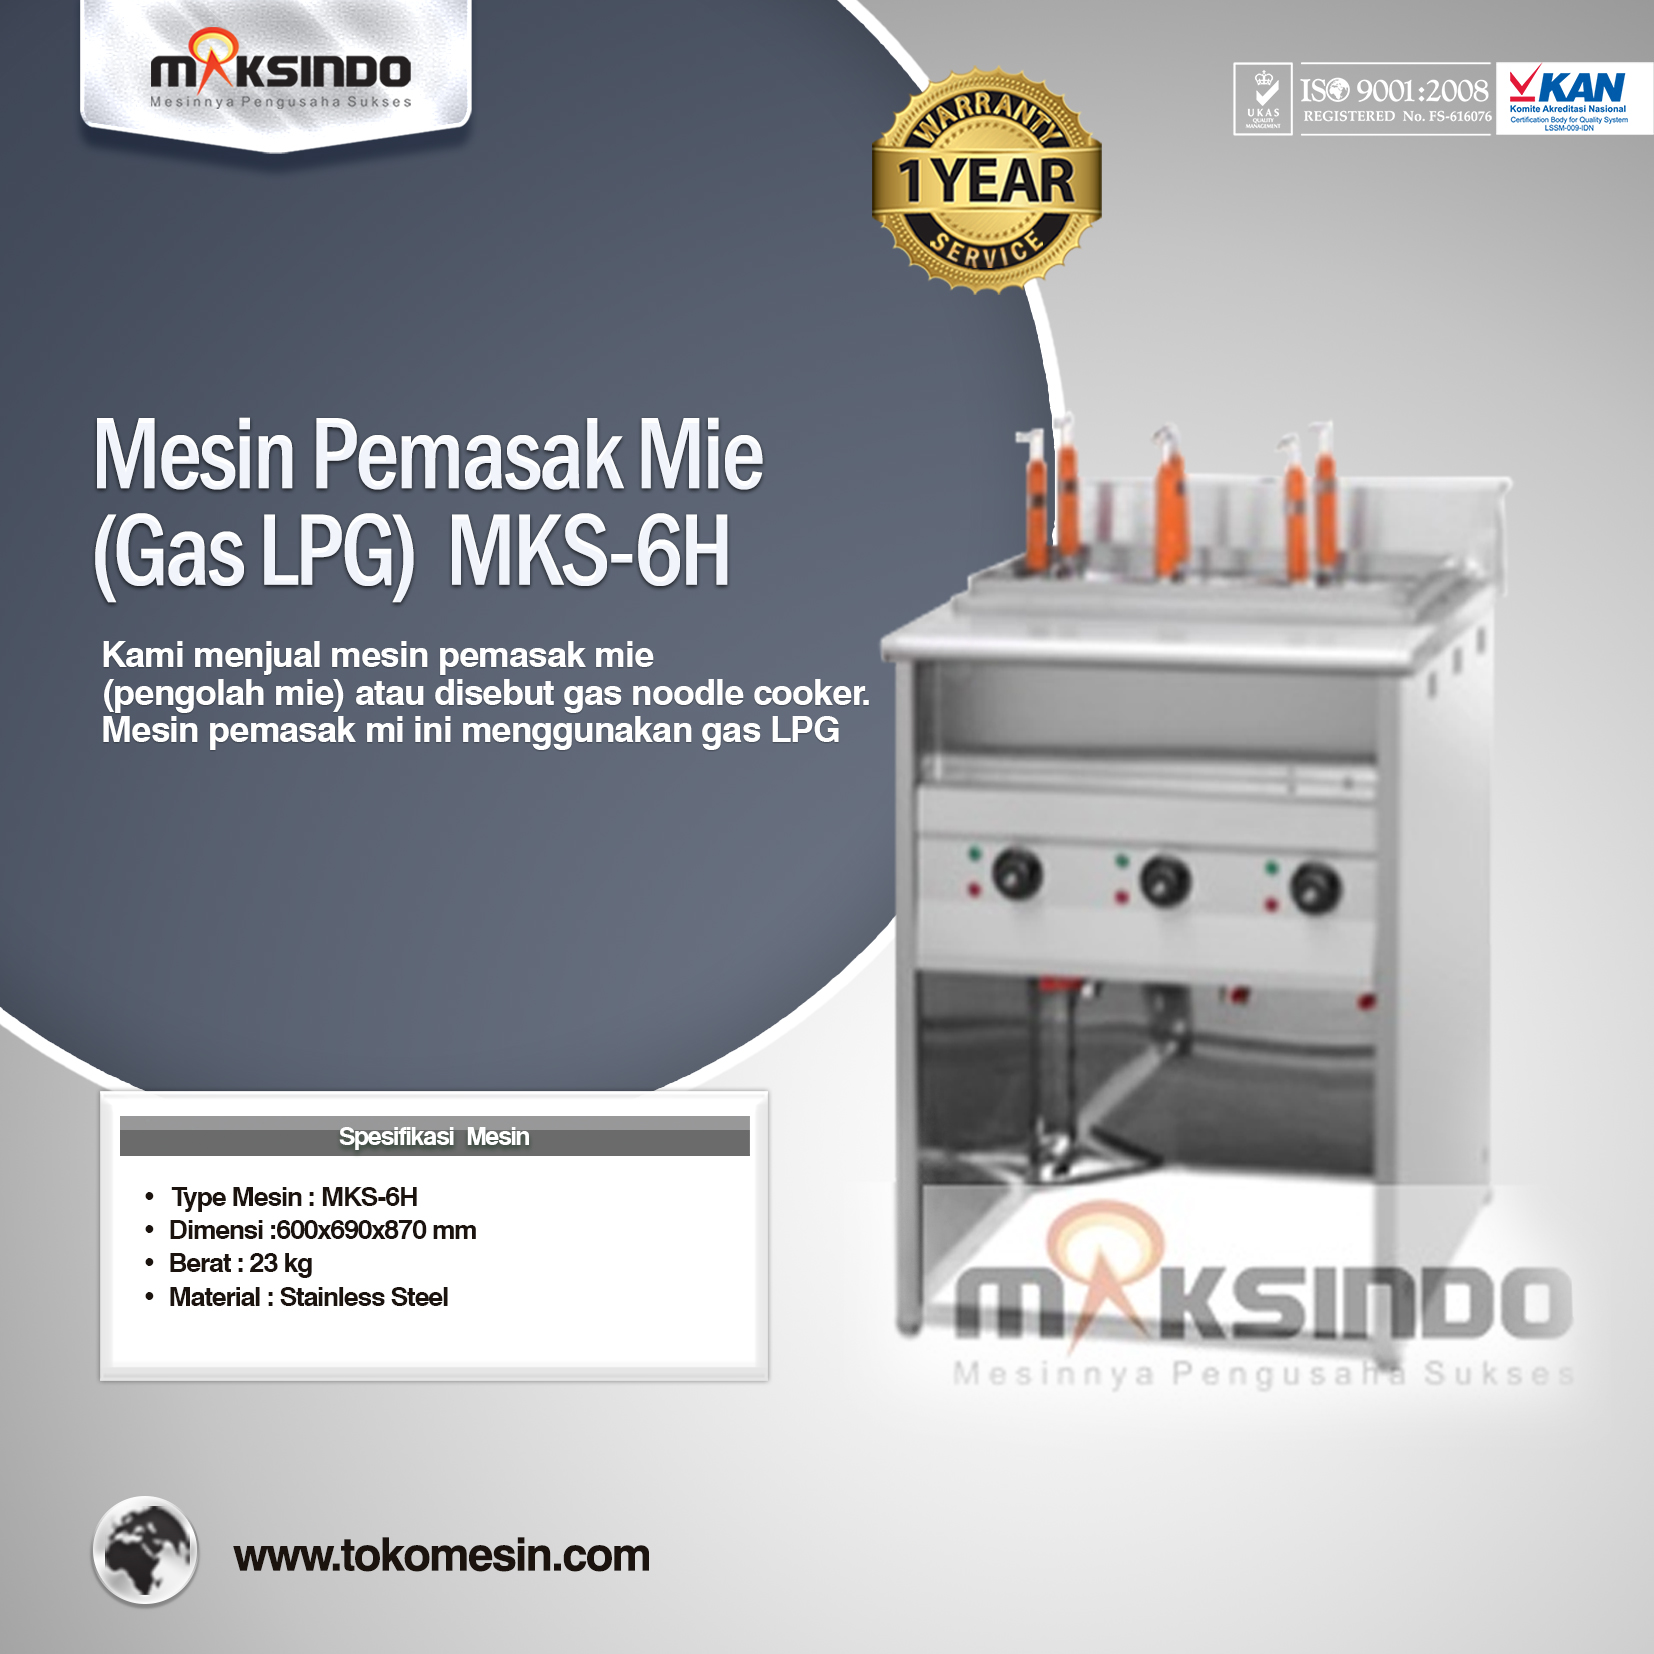 Mesin Pemasak Mie (Gas LPG) MKS-6 H